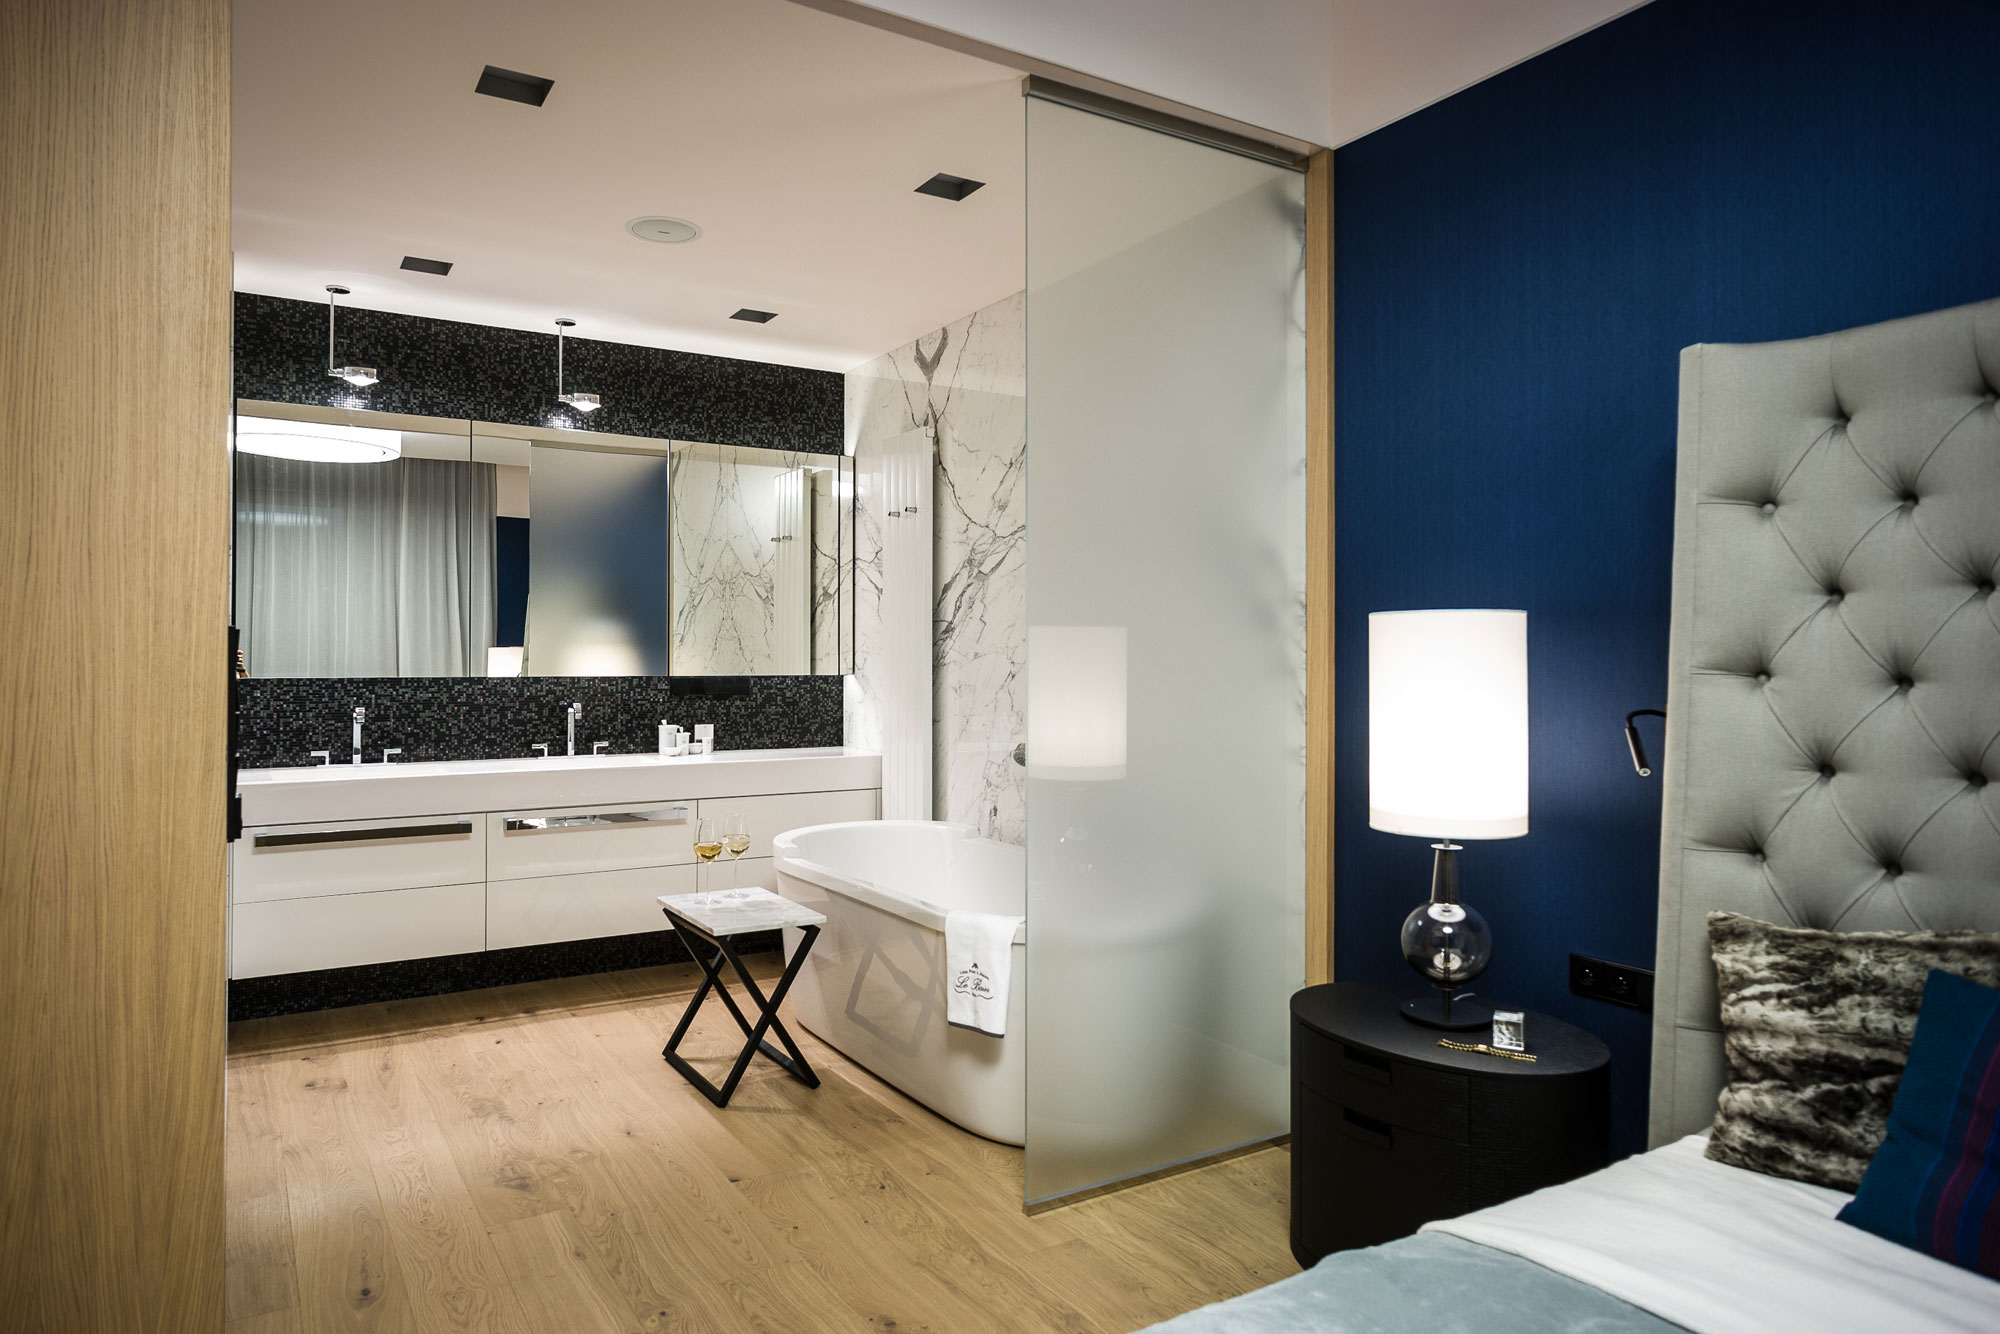 Apartment-in-Nowe-Powisle-20